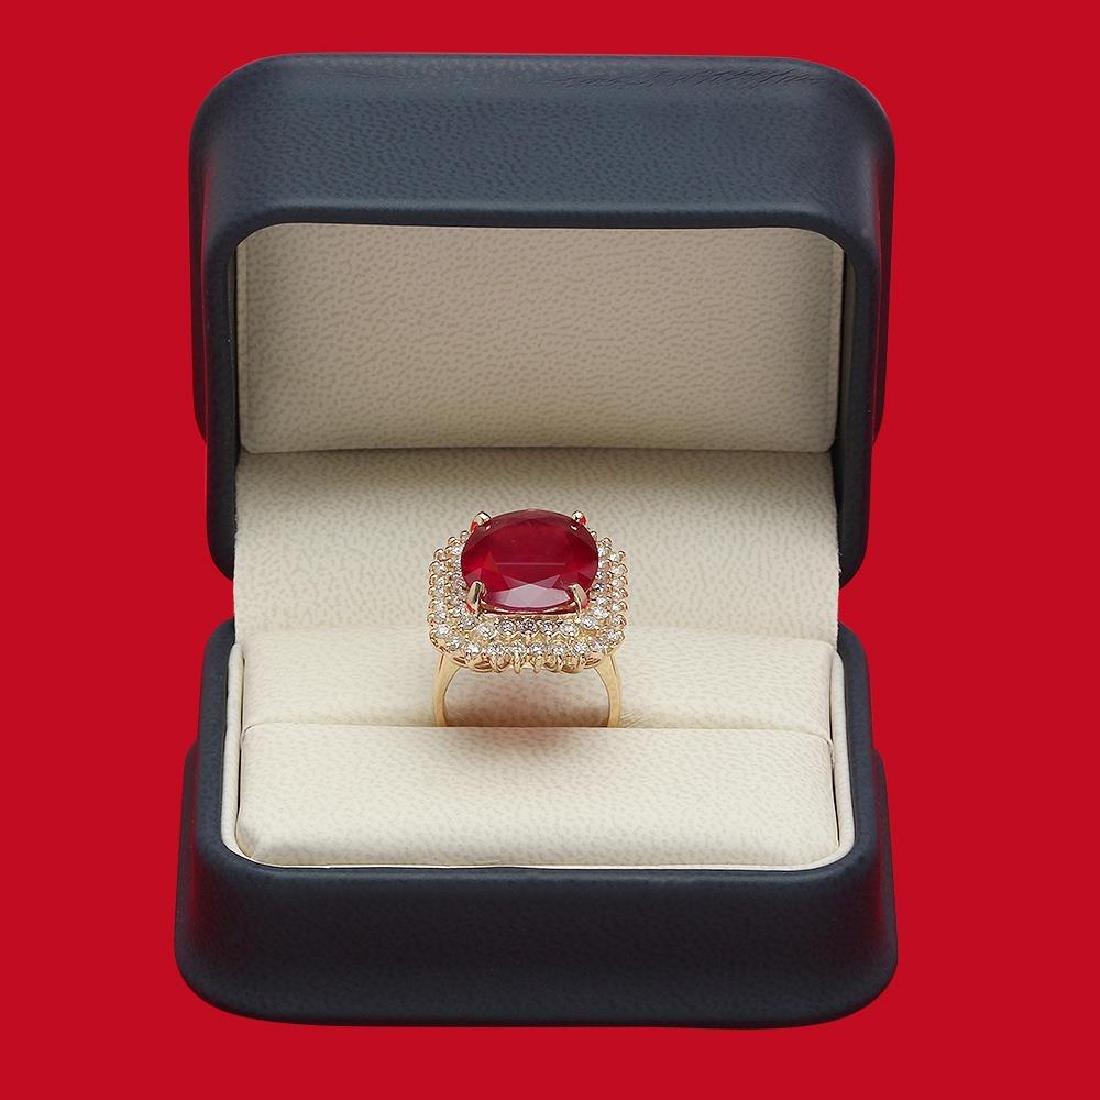 14K Gold 14.12ct Ruby 1.74ct Diamond Ring - 4